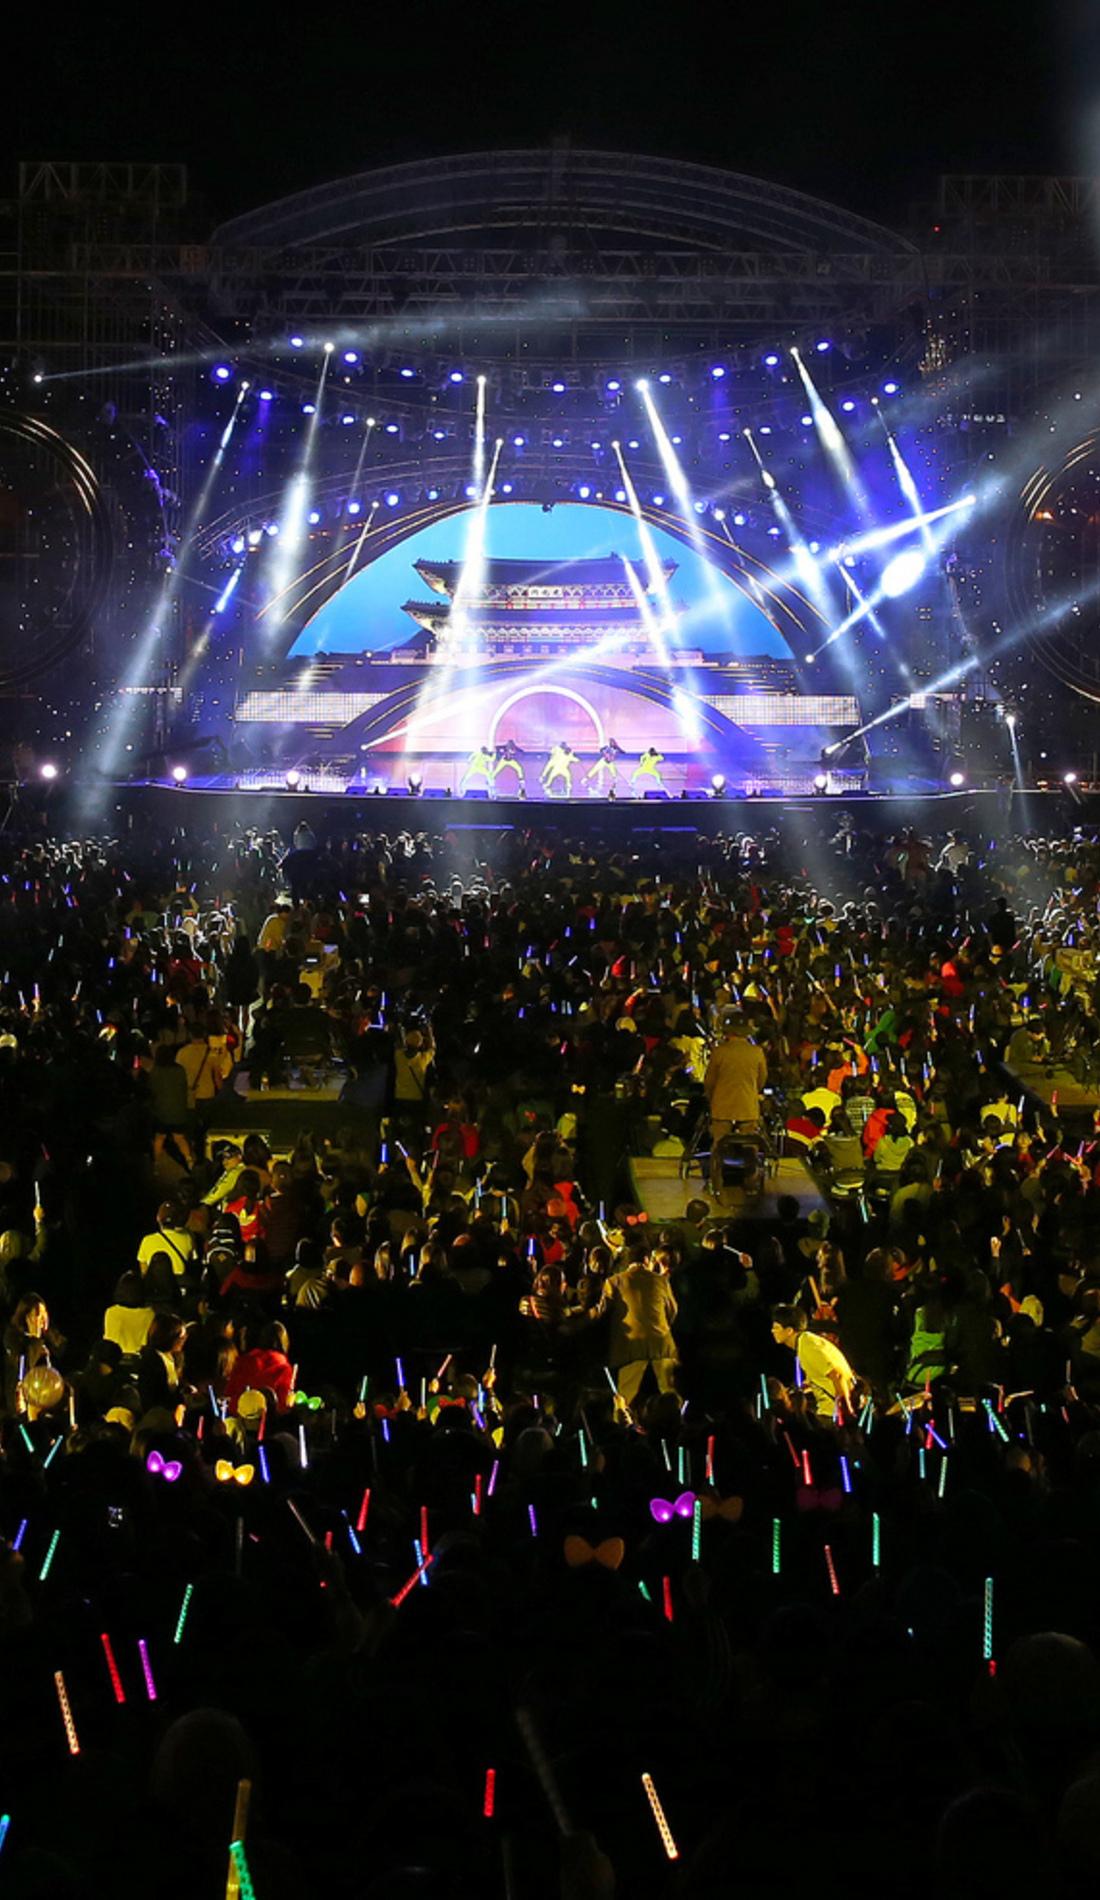 A Festival of Disruption live event